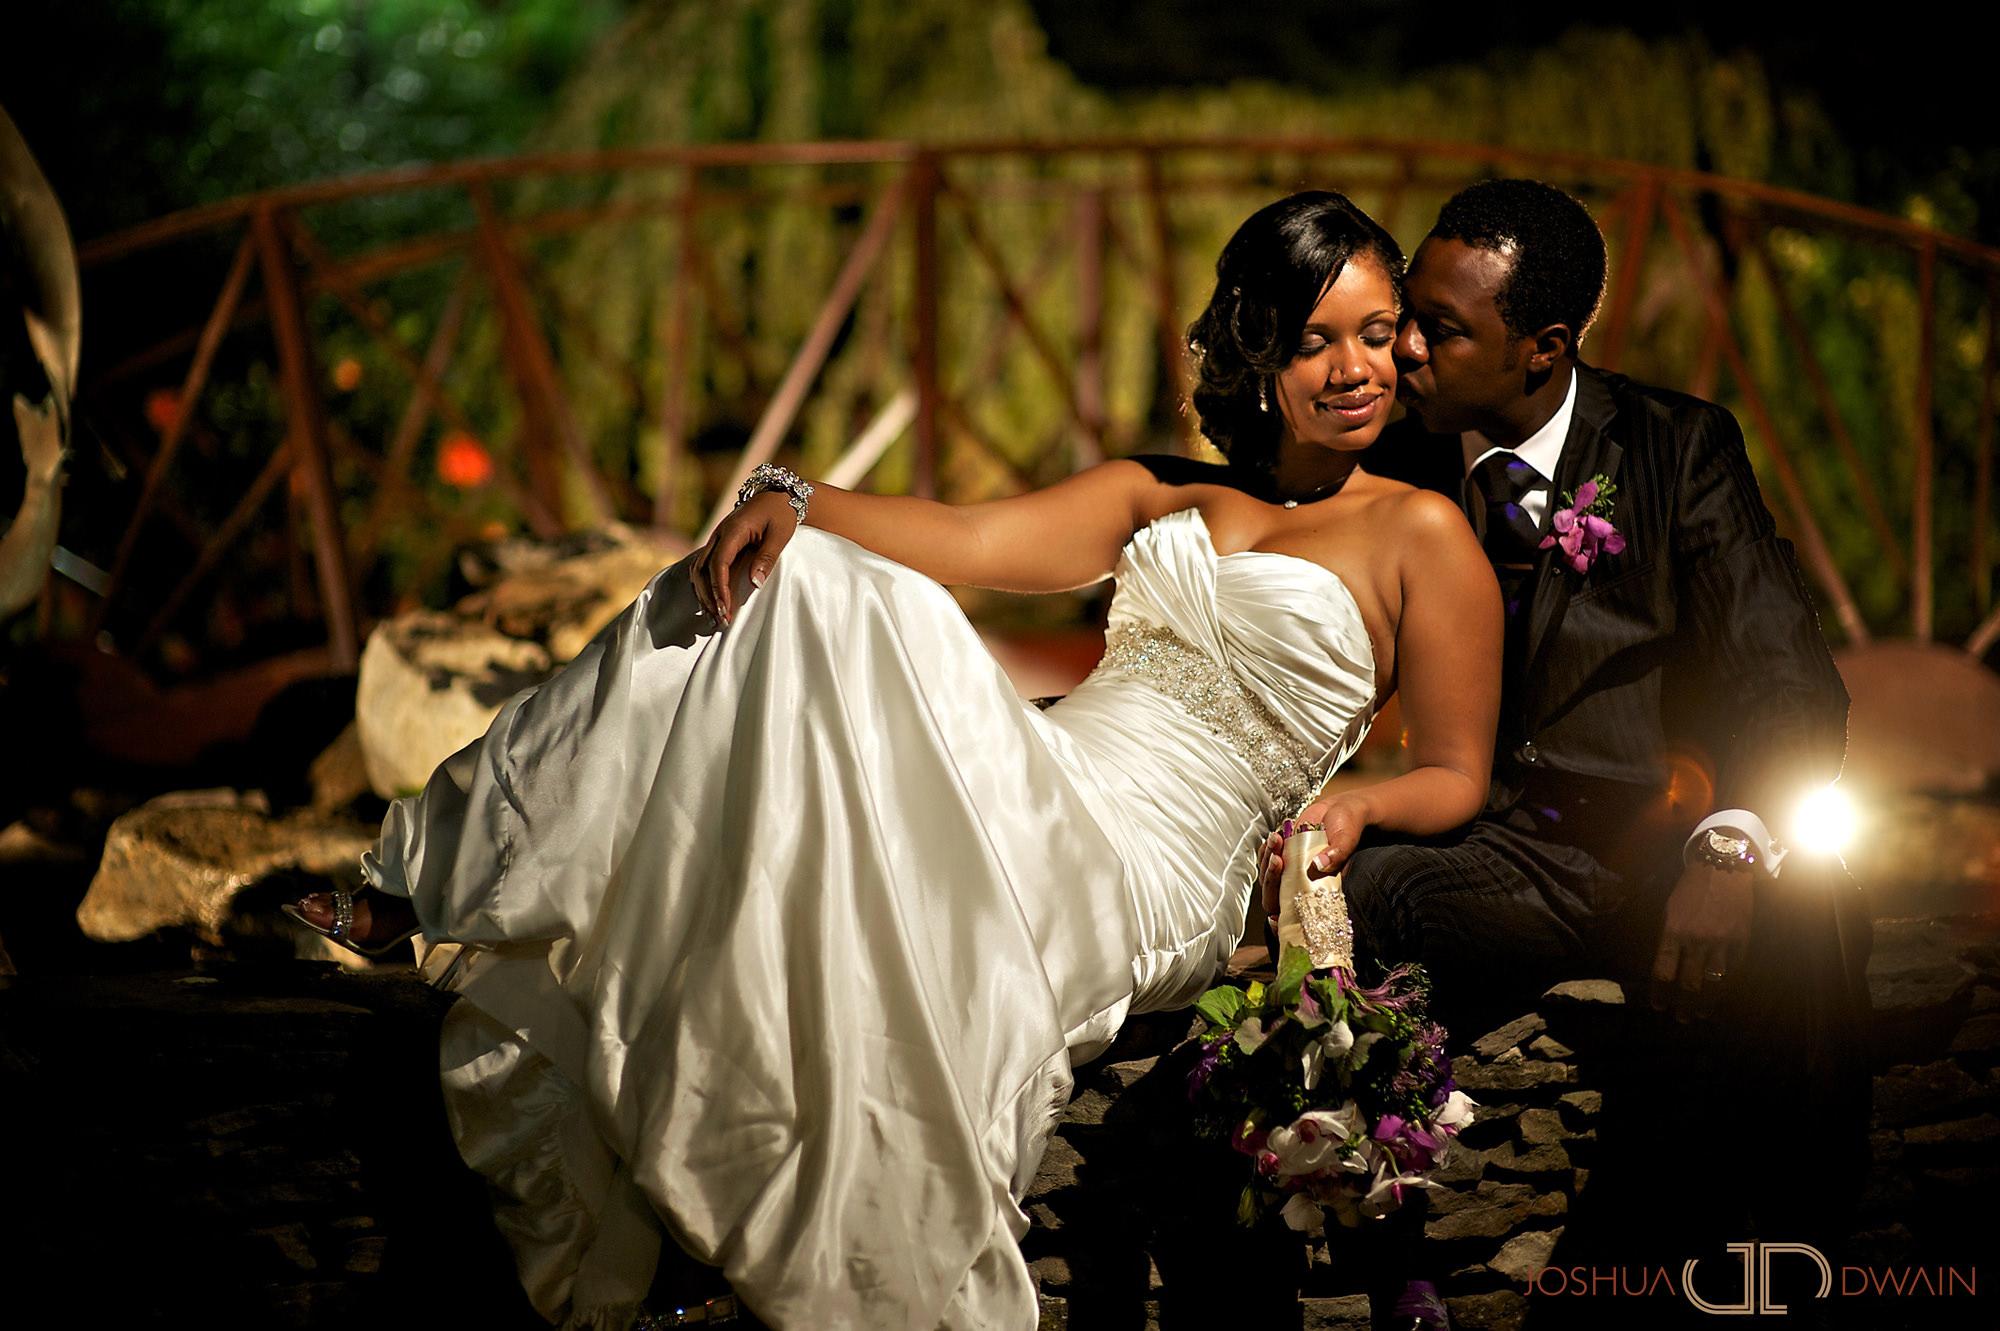 betty-garnel-001-sand-castle-caterers-long-island-wedding-photographer-joshua-dwain-2011-09-09_bg_431